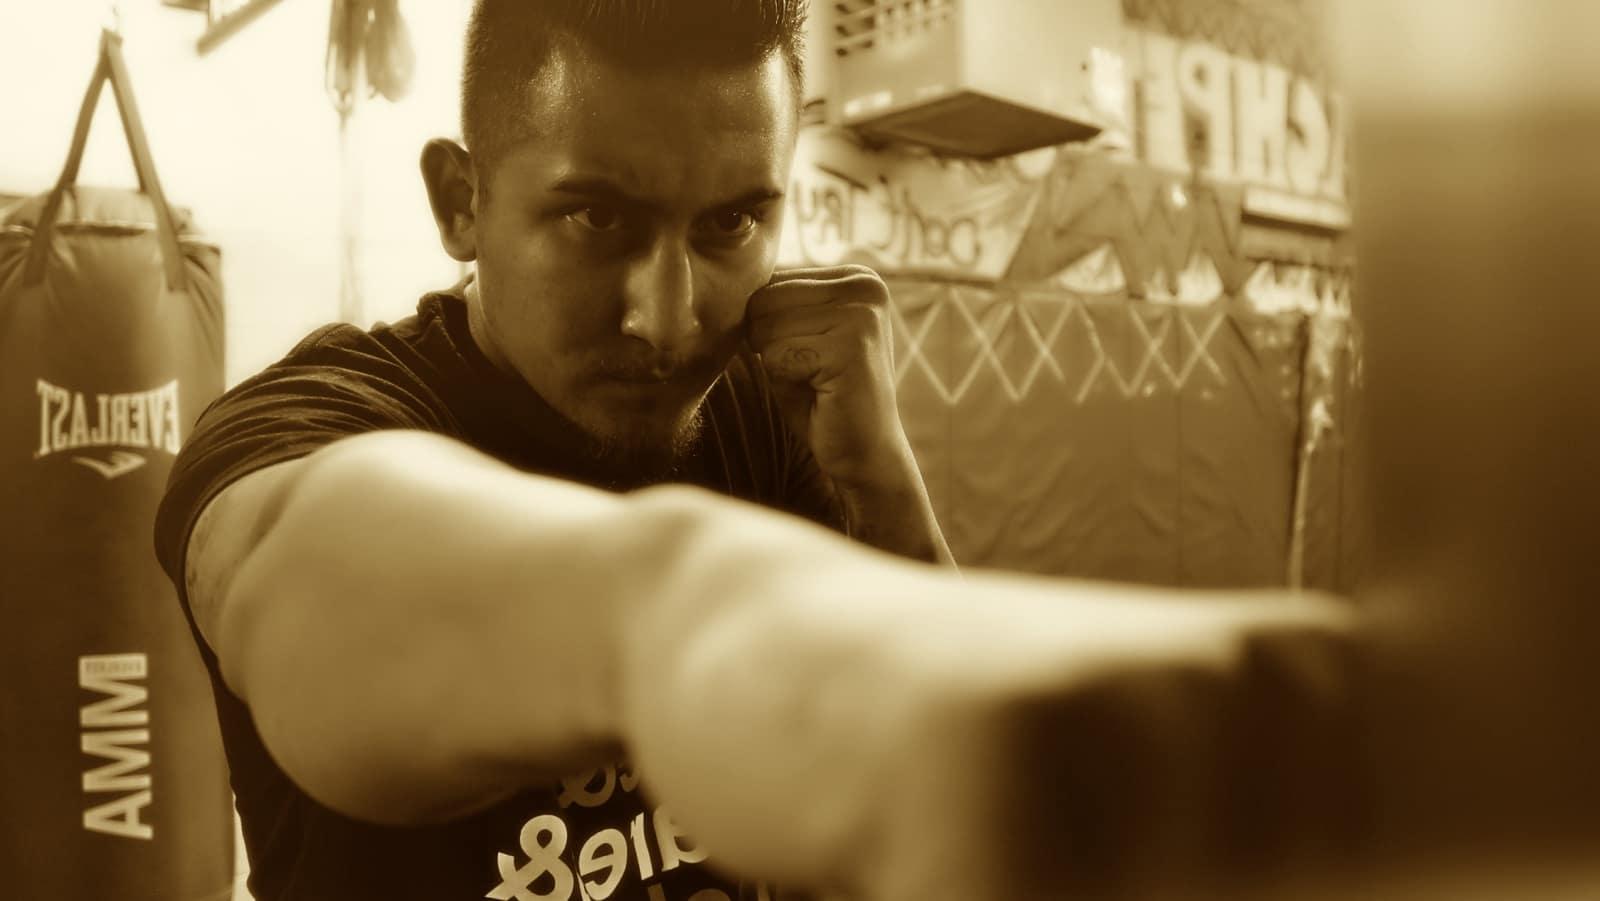 Mejores Sacos de Boxeo